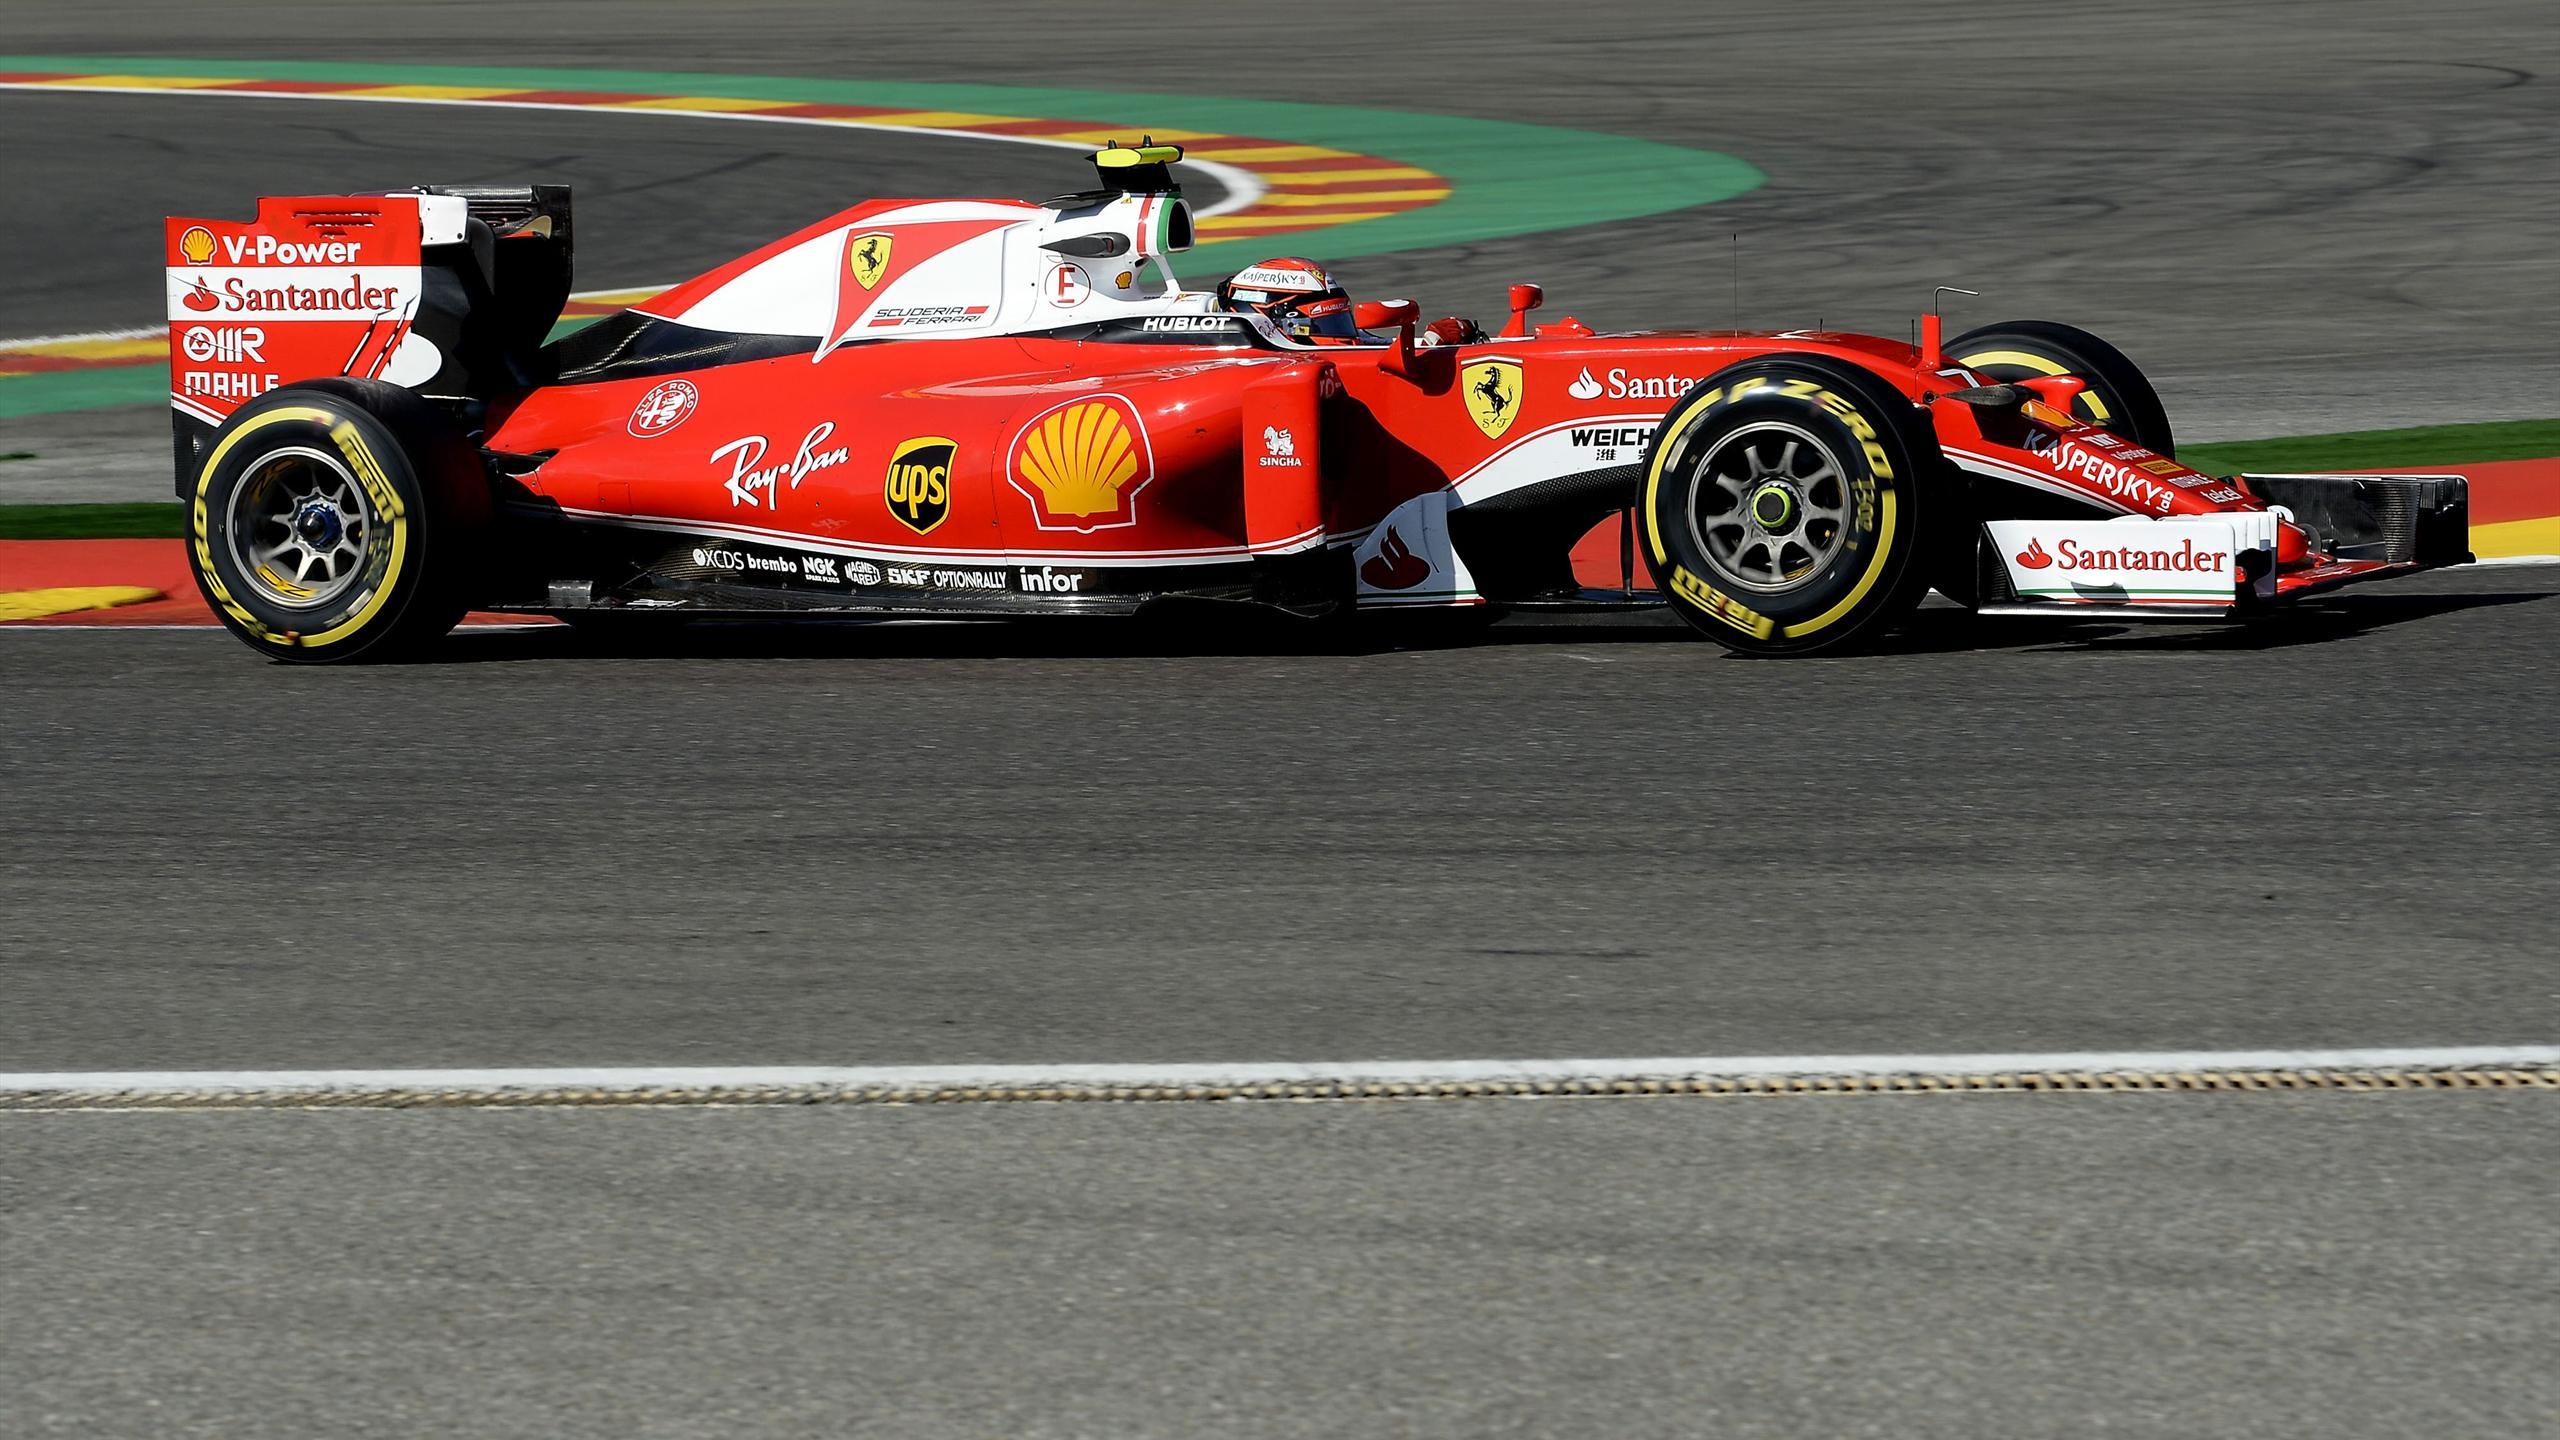 Kimi Räikkönen (Ferrari)  au Grand Prix de Belgique 2016